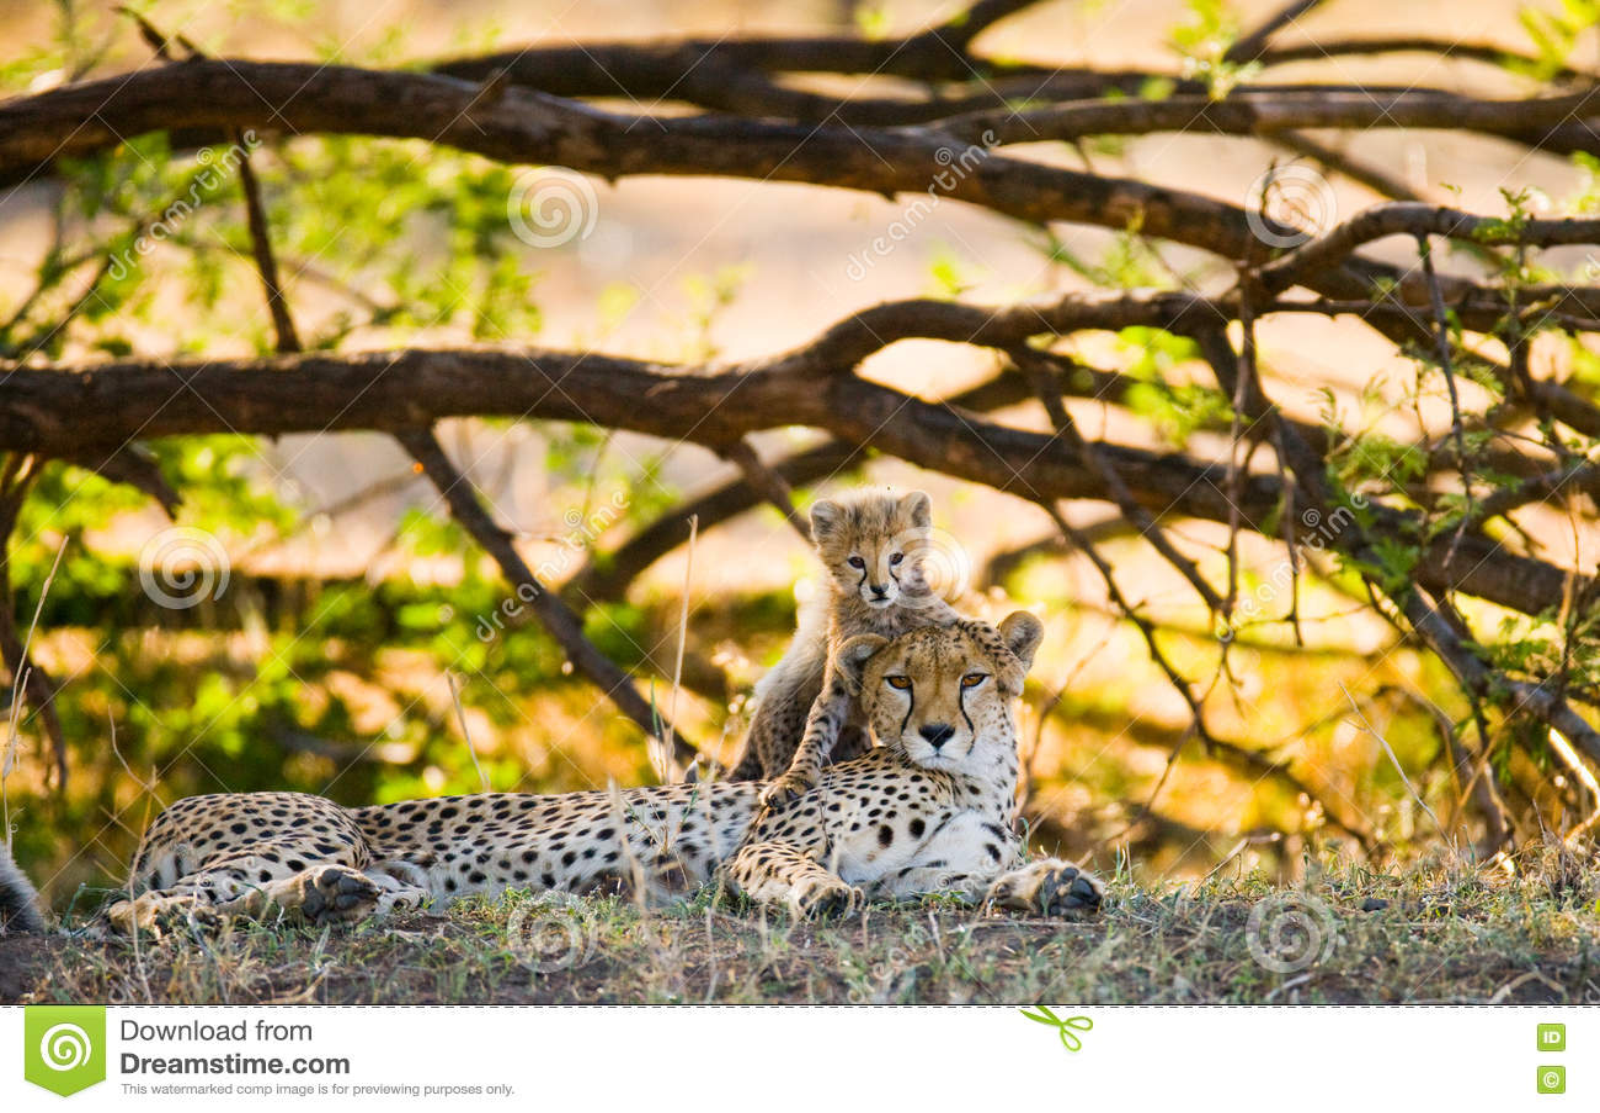 Mother cheetah and her cub in the savannah. Kenya. Tanzania. Africa. National Park. Serengeti. Maasai Mara.